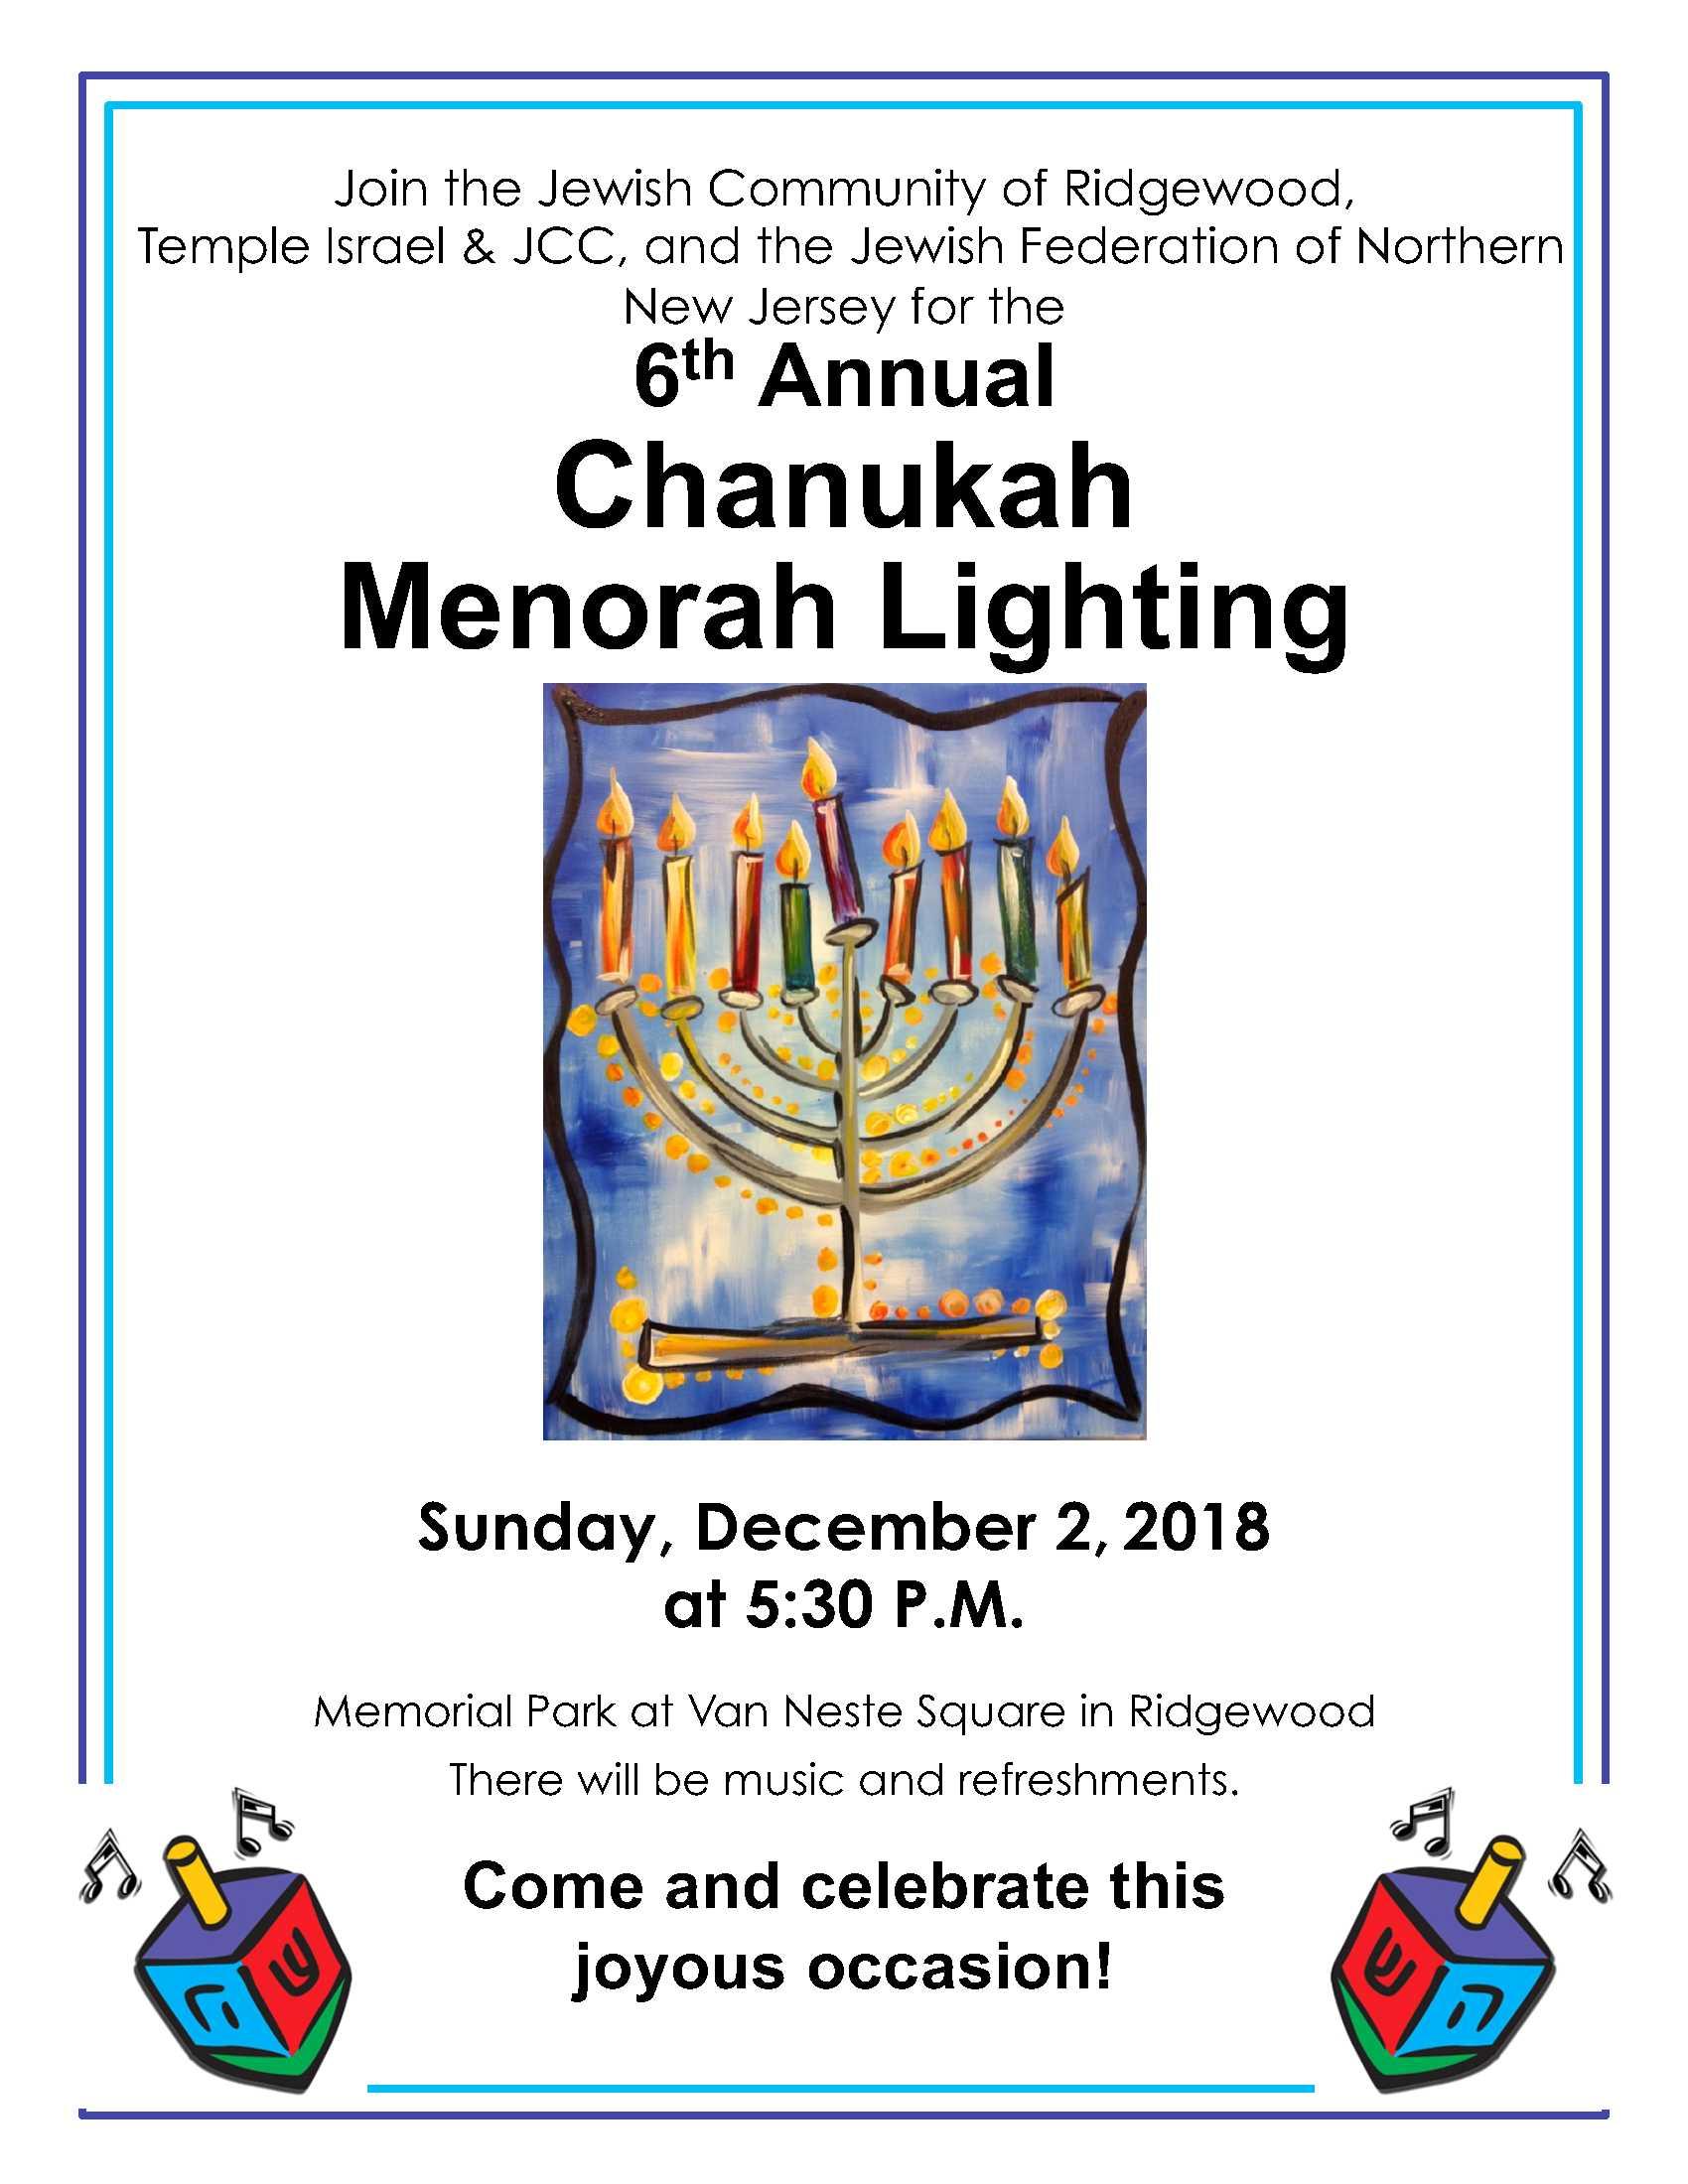 Ridgewood community menorah lighting